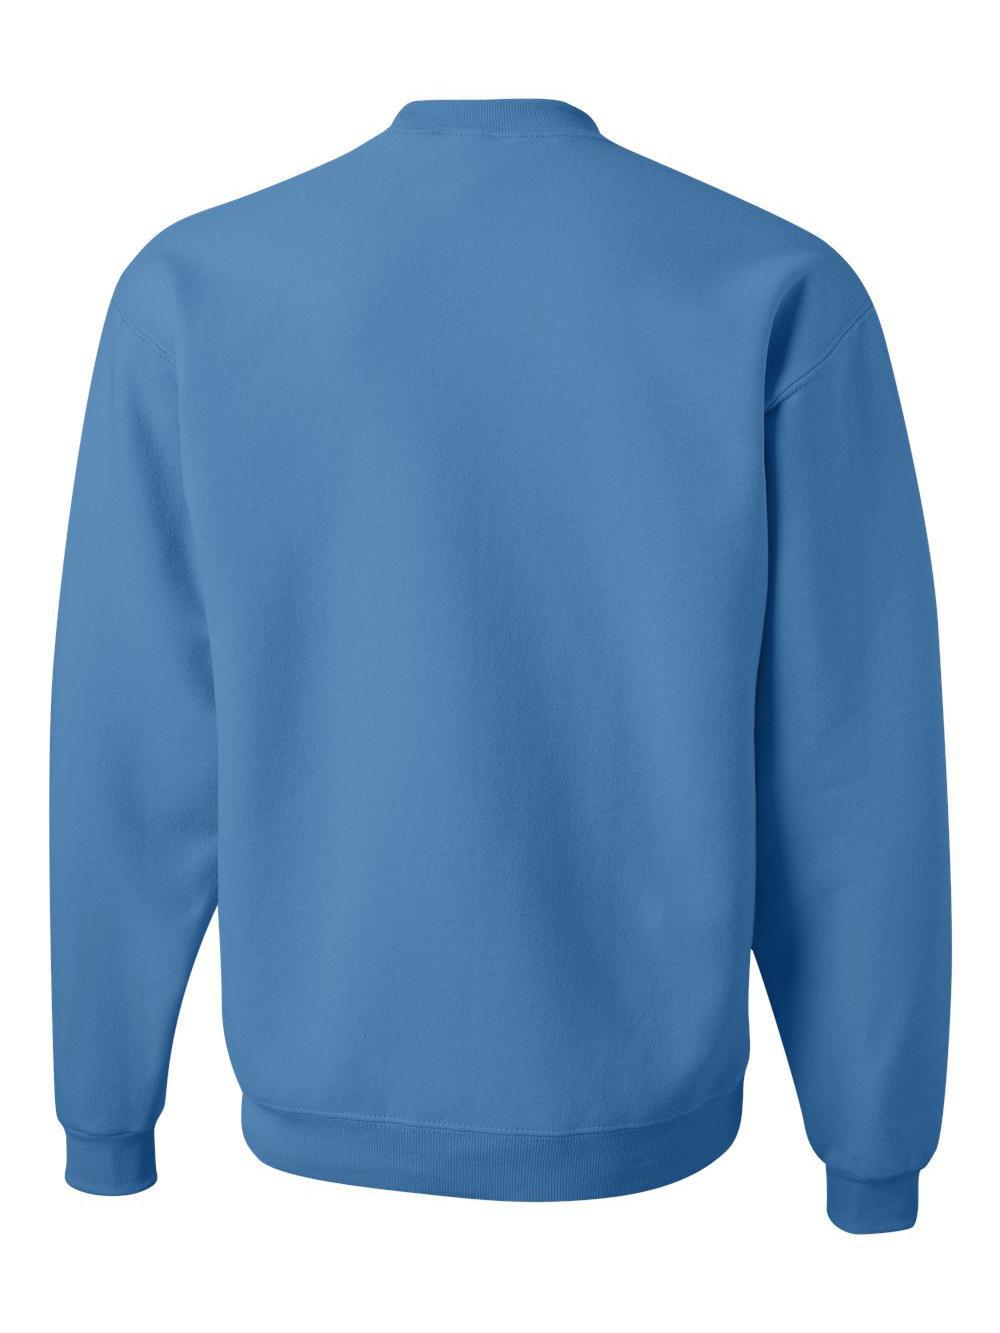 Jerzees-NuBlend-Crewneck-Sweatshirt-562MR thumbnail 31